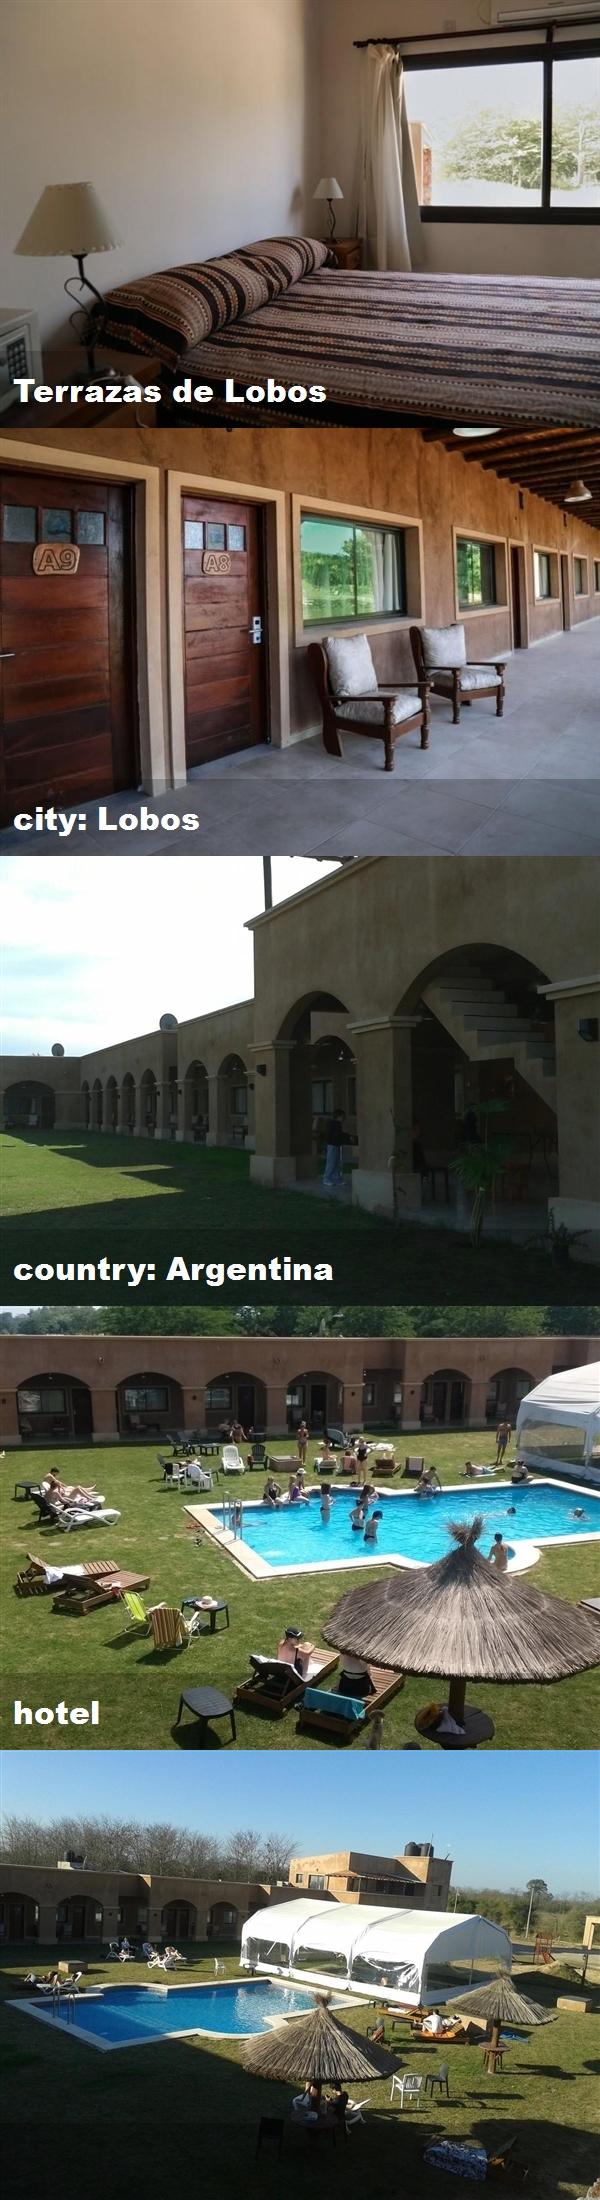 Terrazas De Lobos City Lobos Country Argentina Hotel